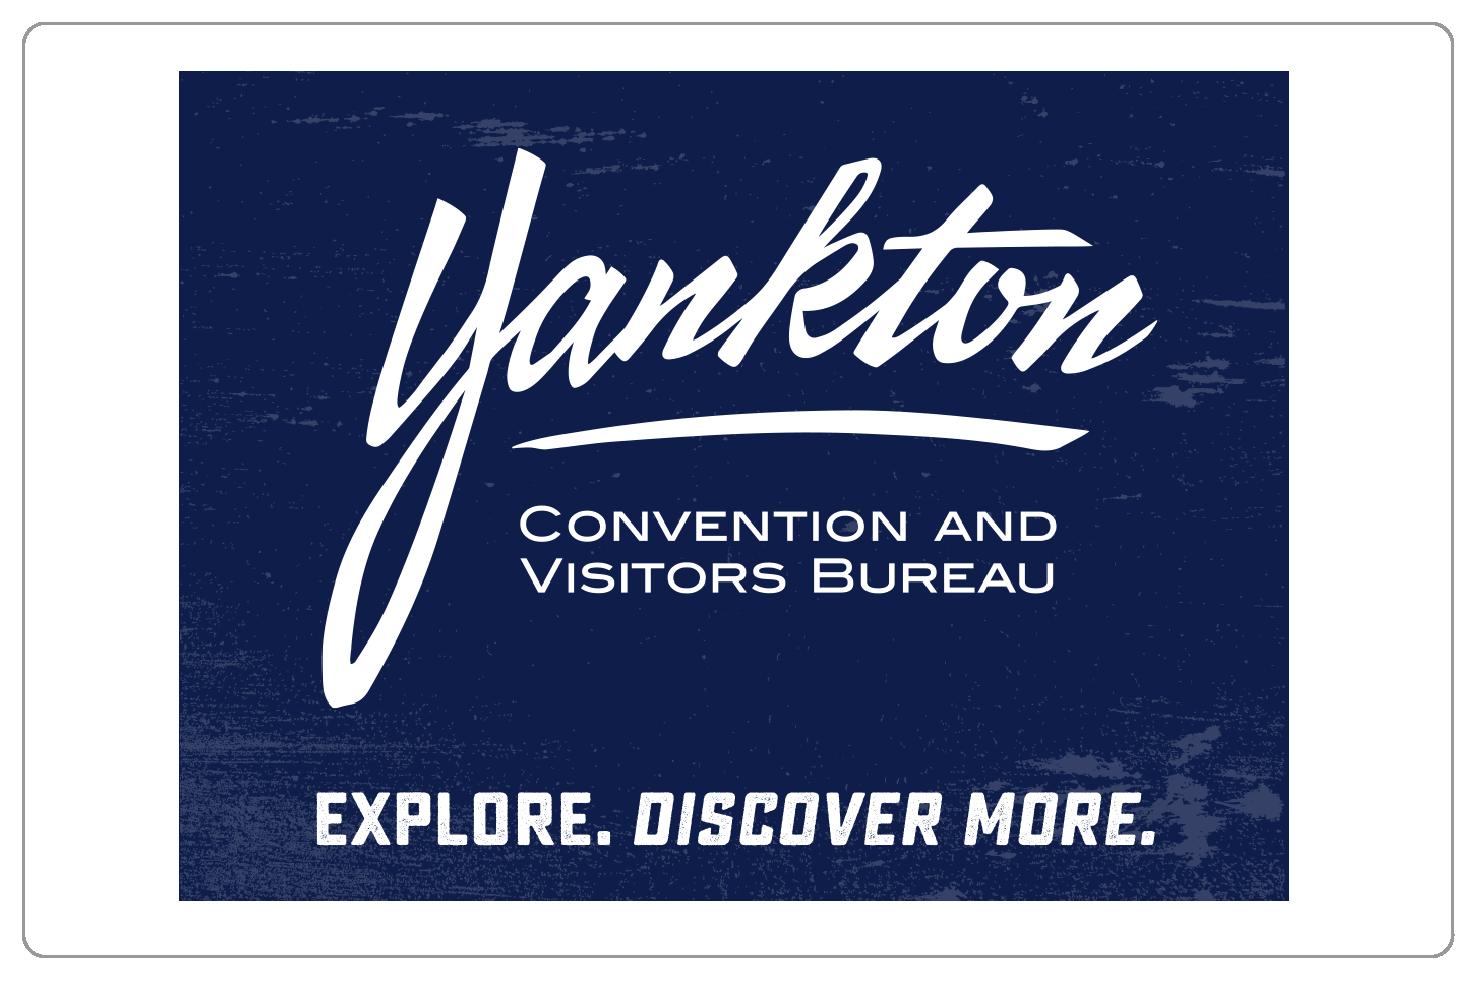 Yankton Convention and Visitors Bureau